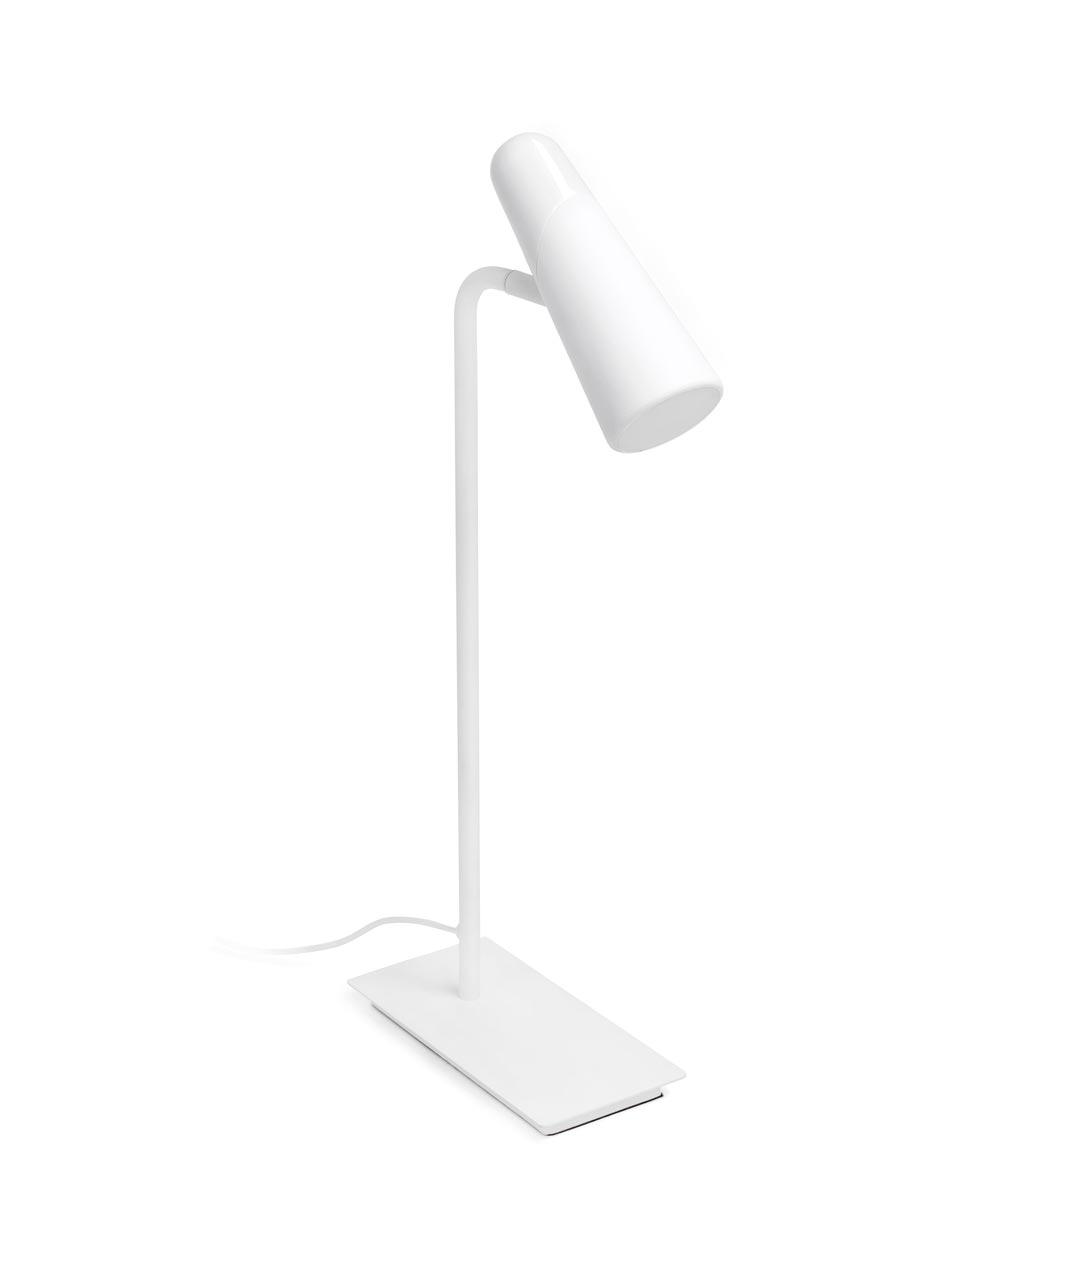 Lámpara mesa minimalista blanca LAO LED